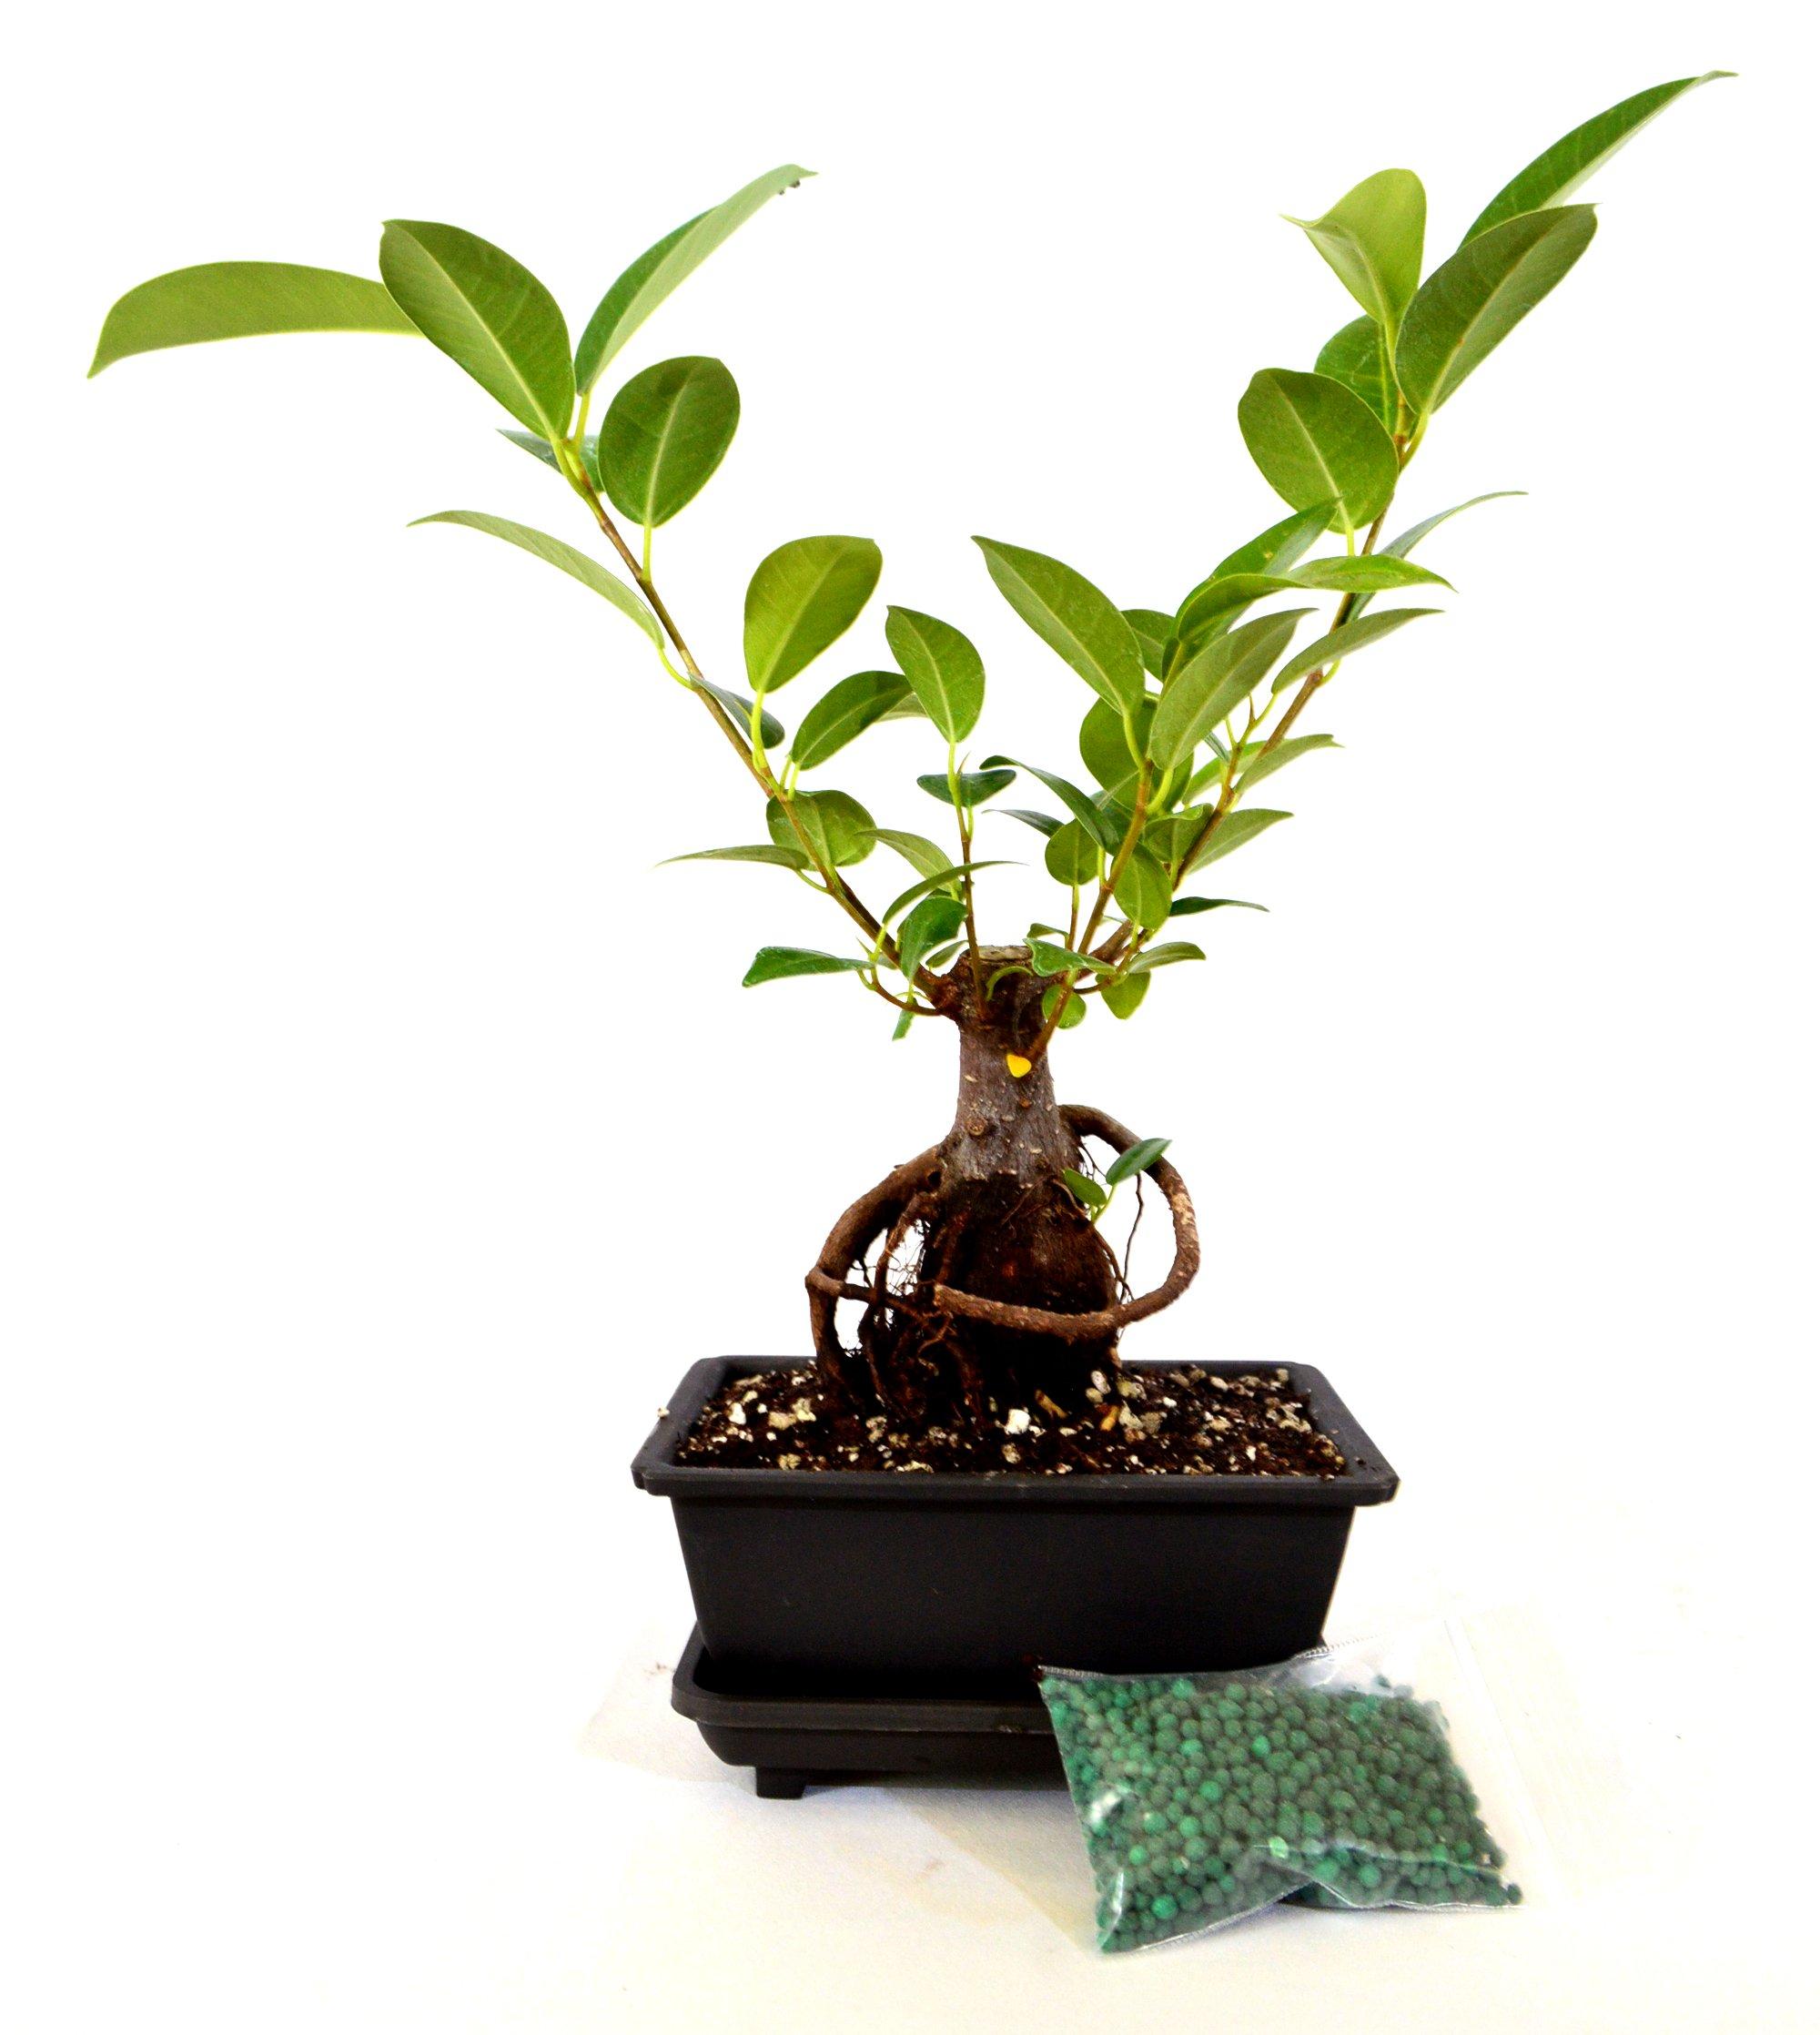 9GreenBox - Live Ginseng Ficus Bonsai Tree Bonsai - Small Ficus Retusa - Water Tray & Fertilizer Gift by 9GreenBox.com